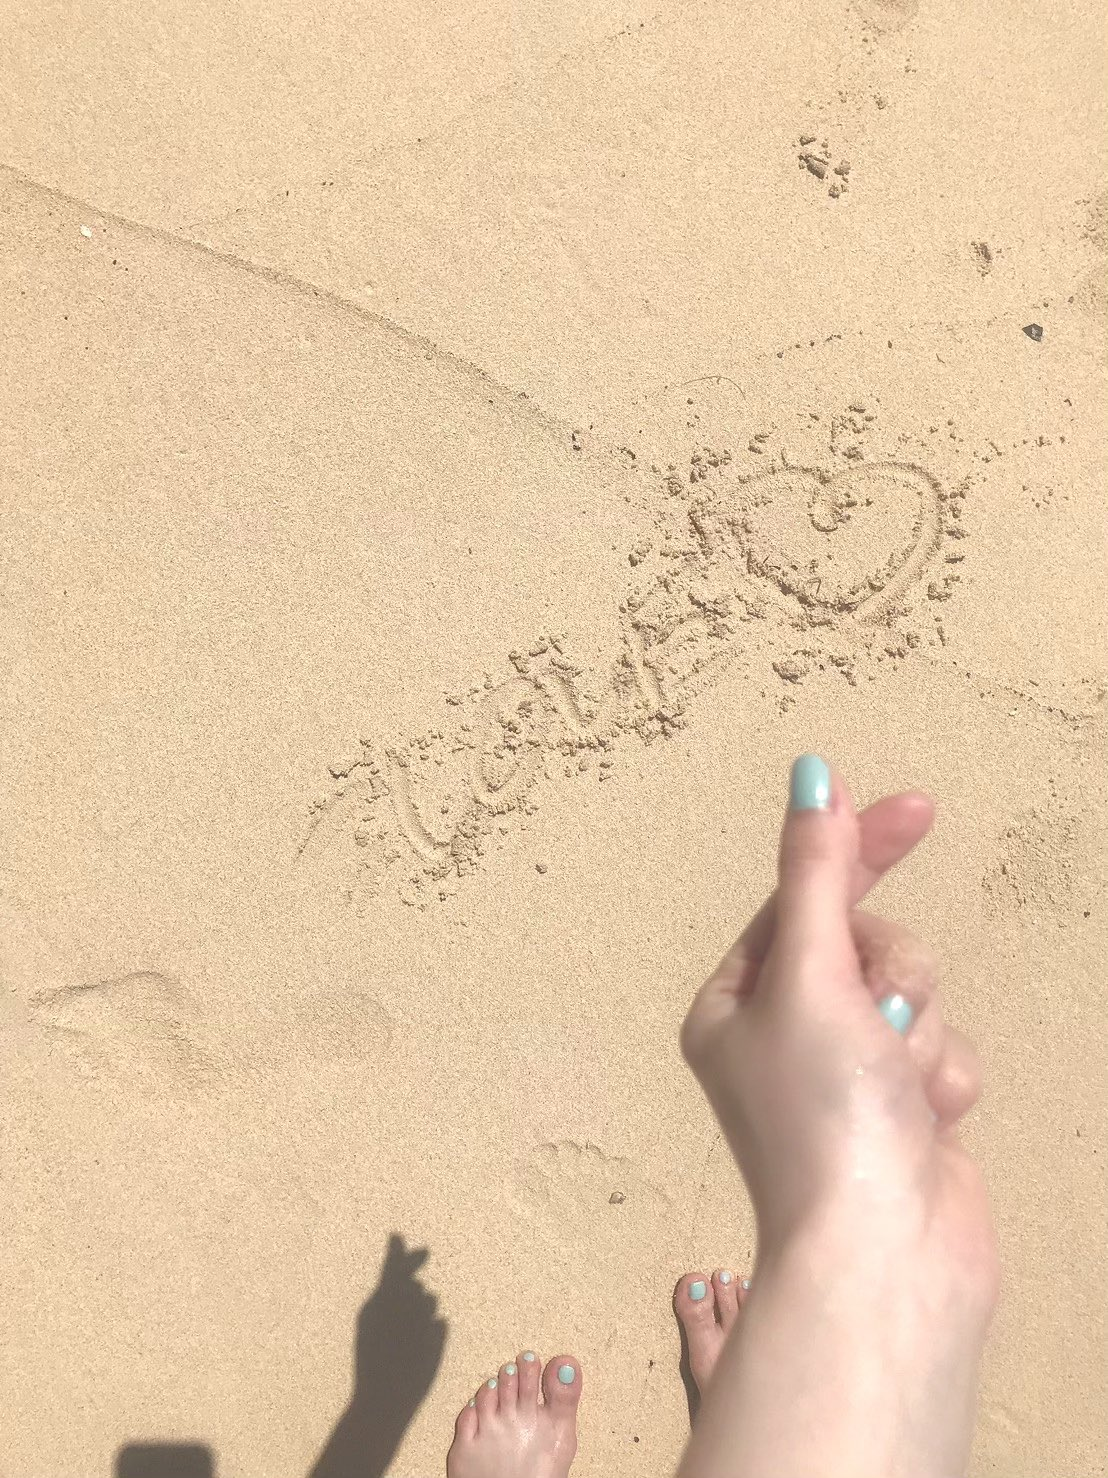 =LOVE大谷映美里「砂浜で輝く美スタイル&ビキニ」ファースト写真集の予約がスタート【画像2枚】の画像001